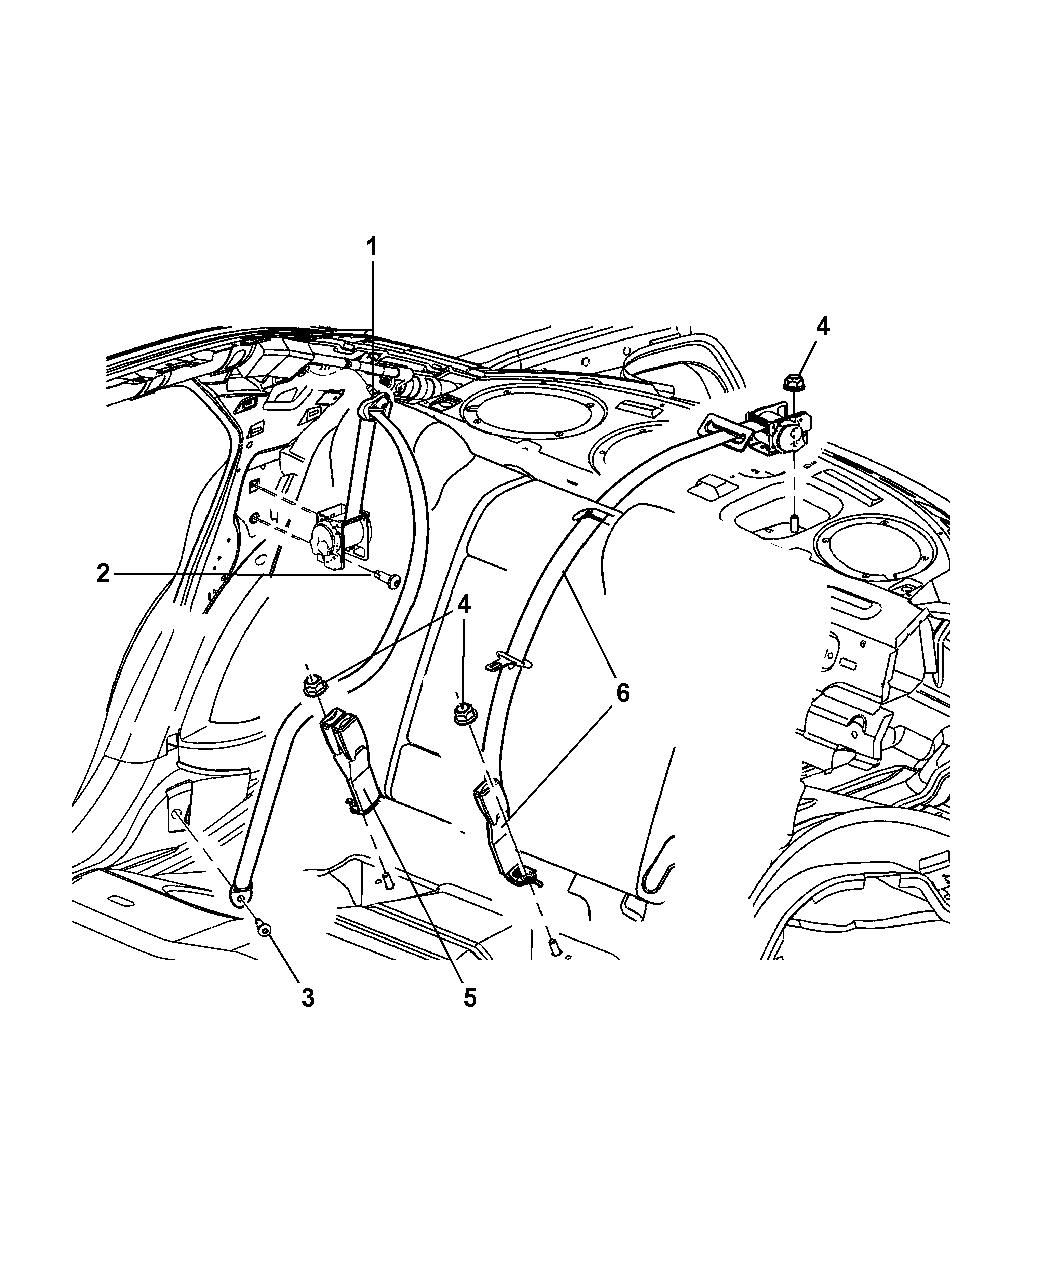 Ux54xt1ae